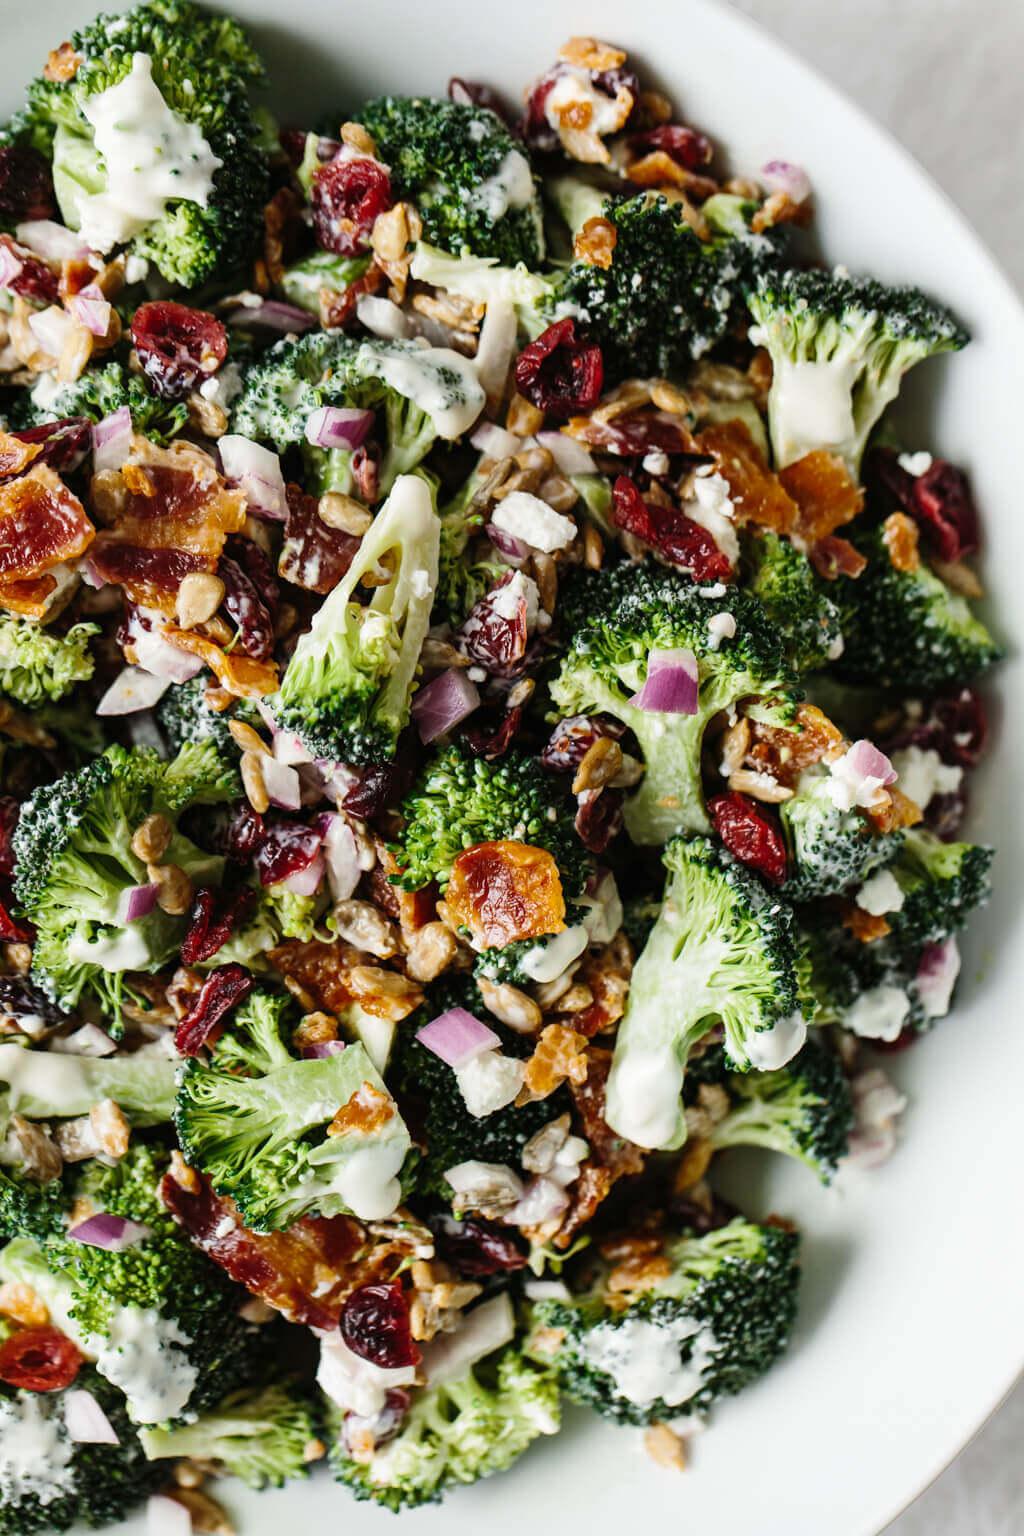 11. Broccoli Salad